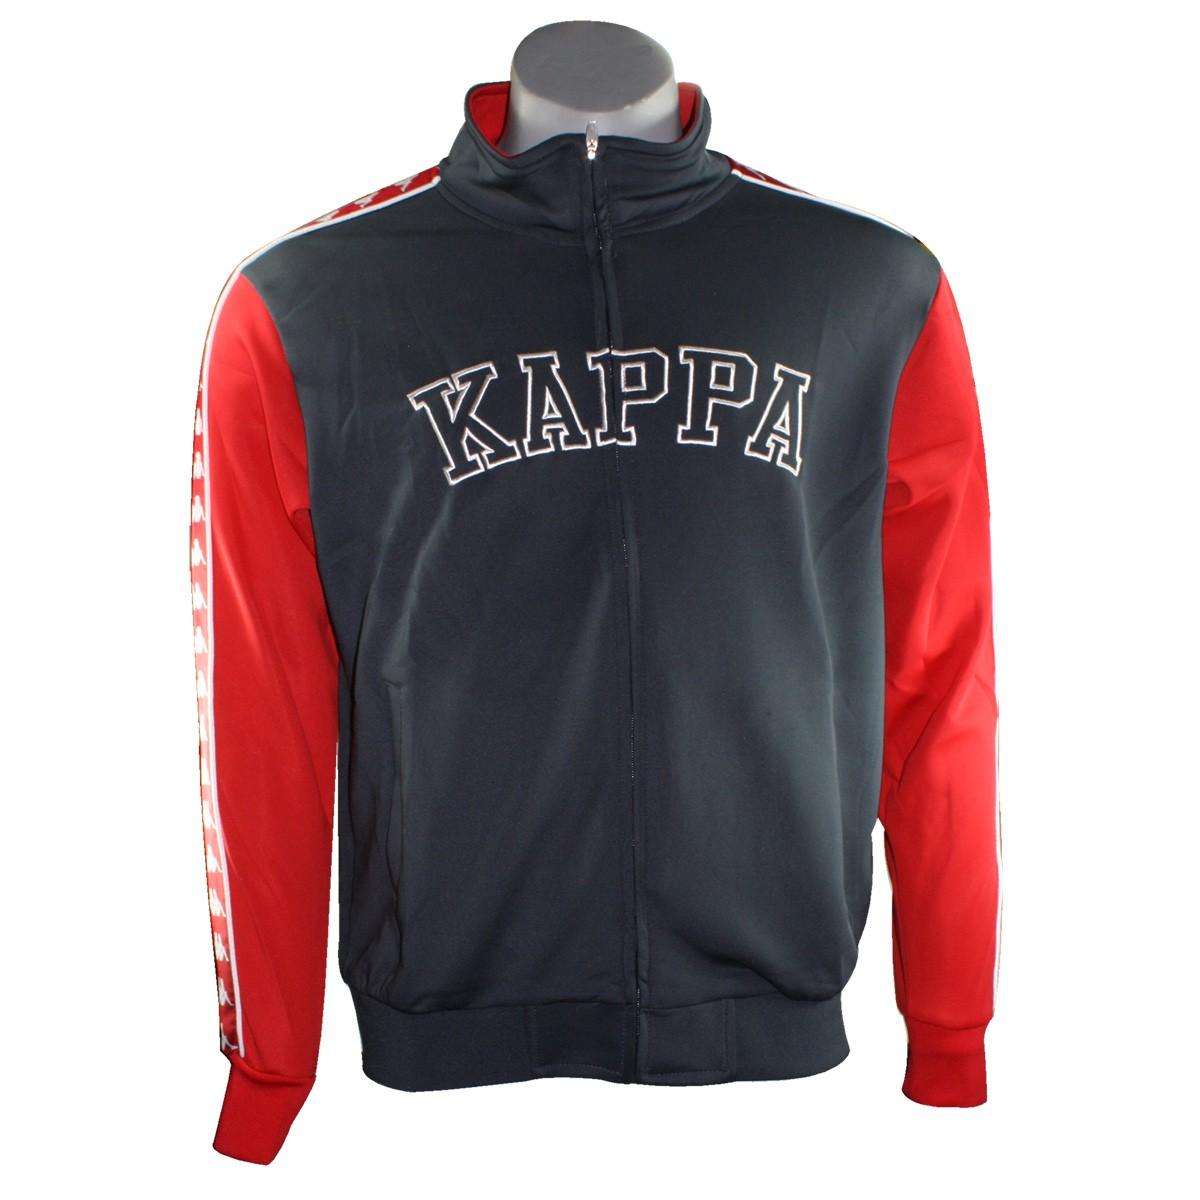 Jaqueta Kappa Banda Teitil 302ZKL0 Grafite Vermelho b8f7b09a43c10